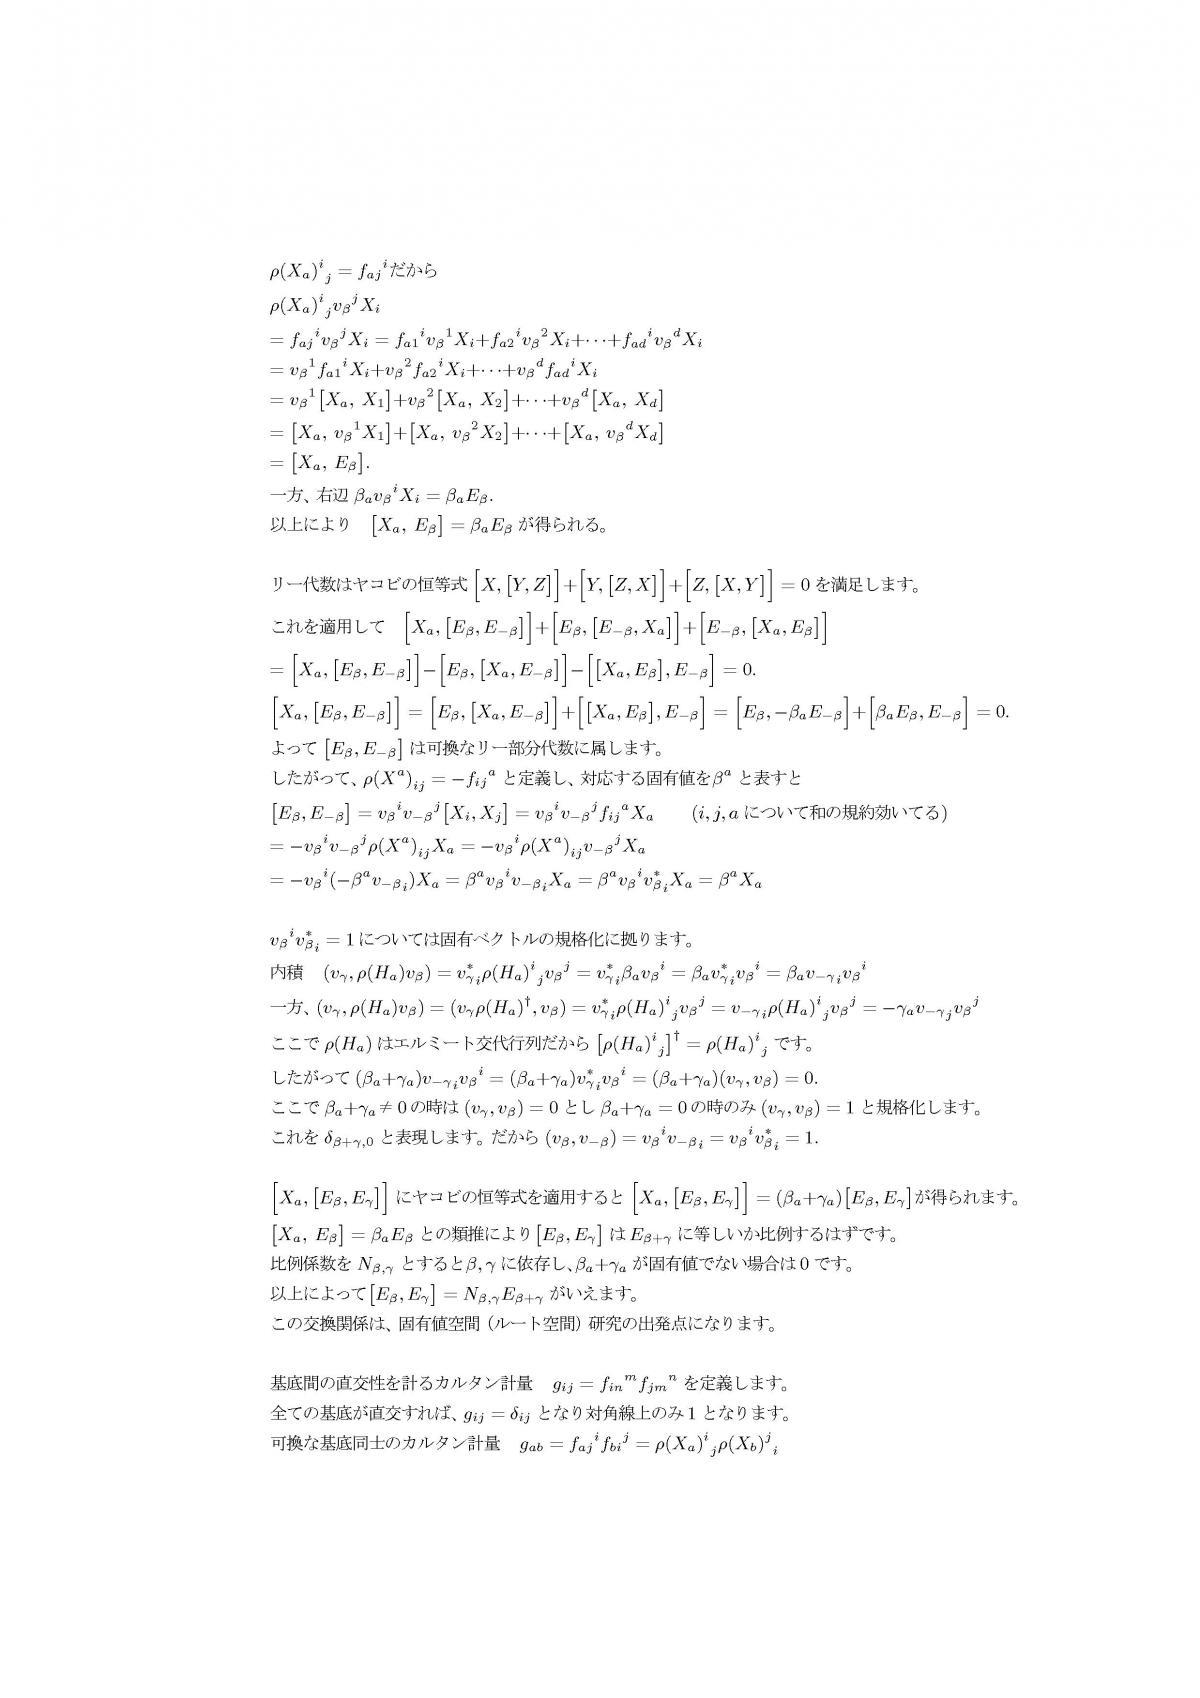 grp130828b.jpg